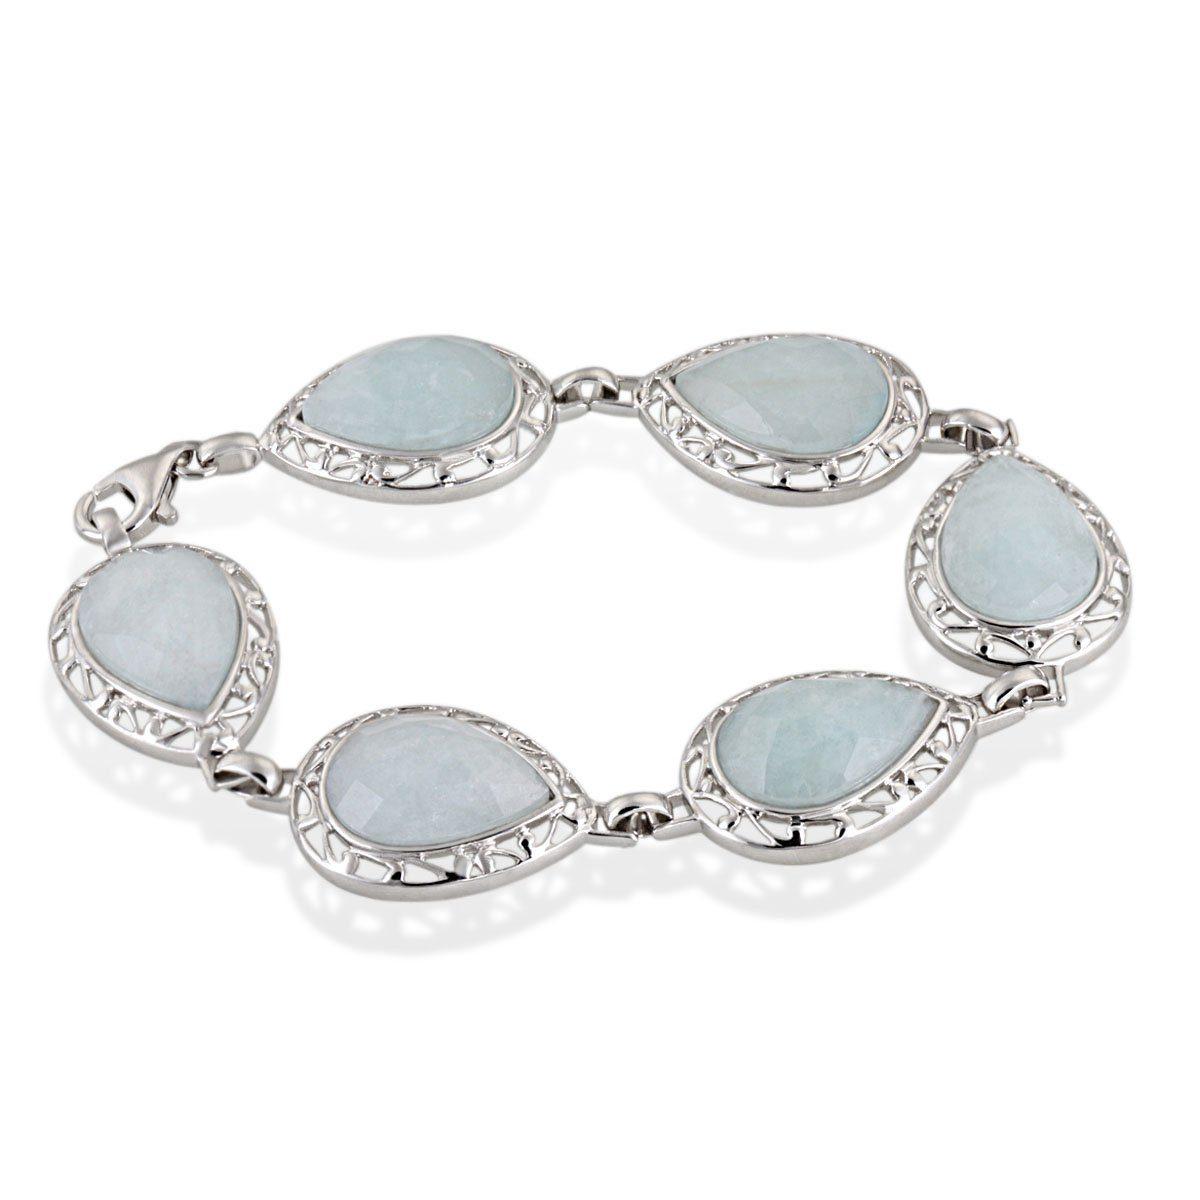 Averdin Armband 925/- Sterlingsilber 6 blaue Aquamarine